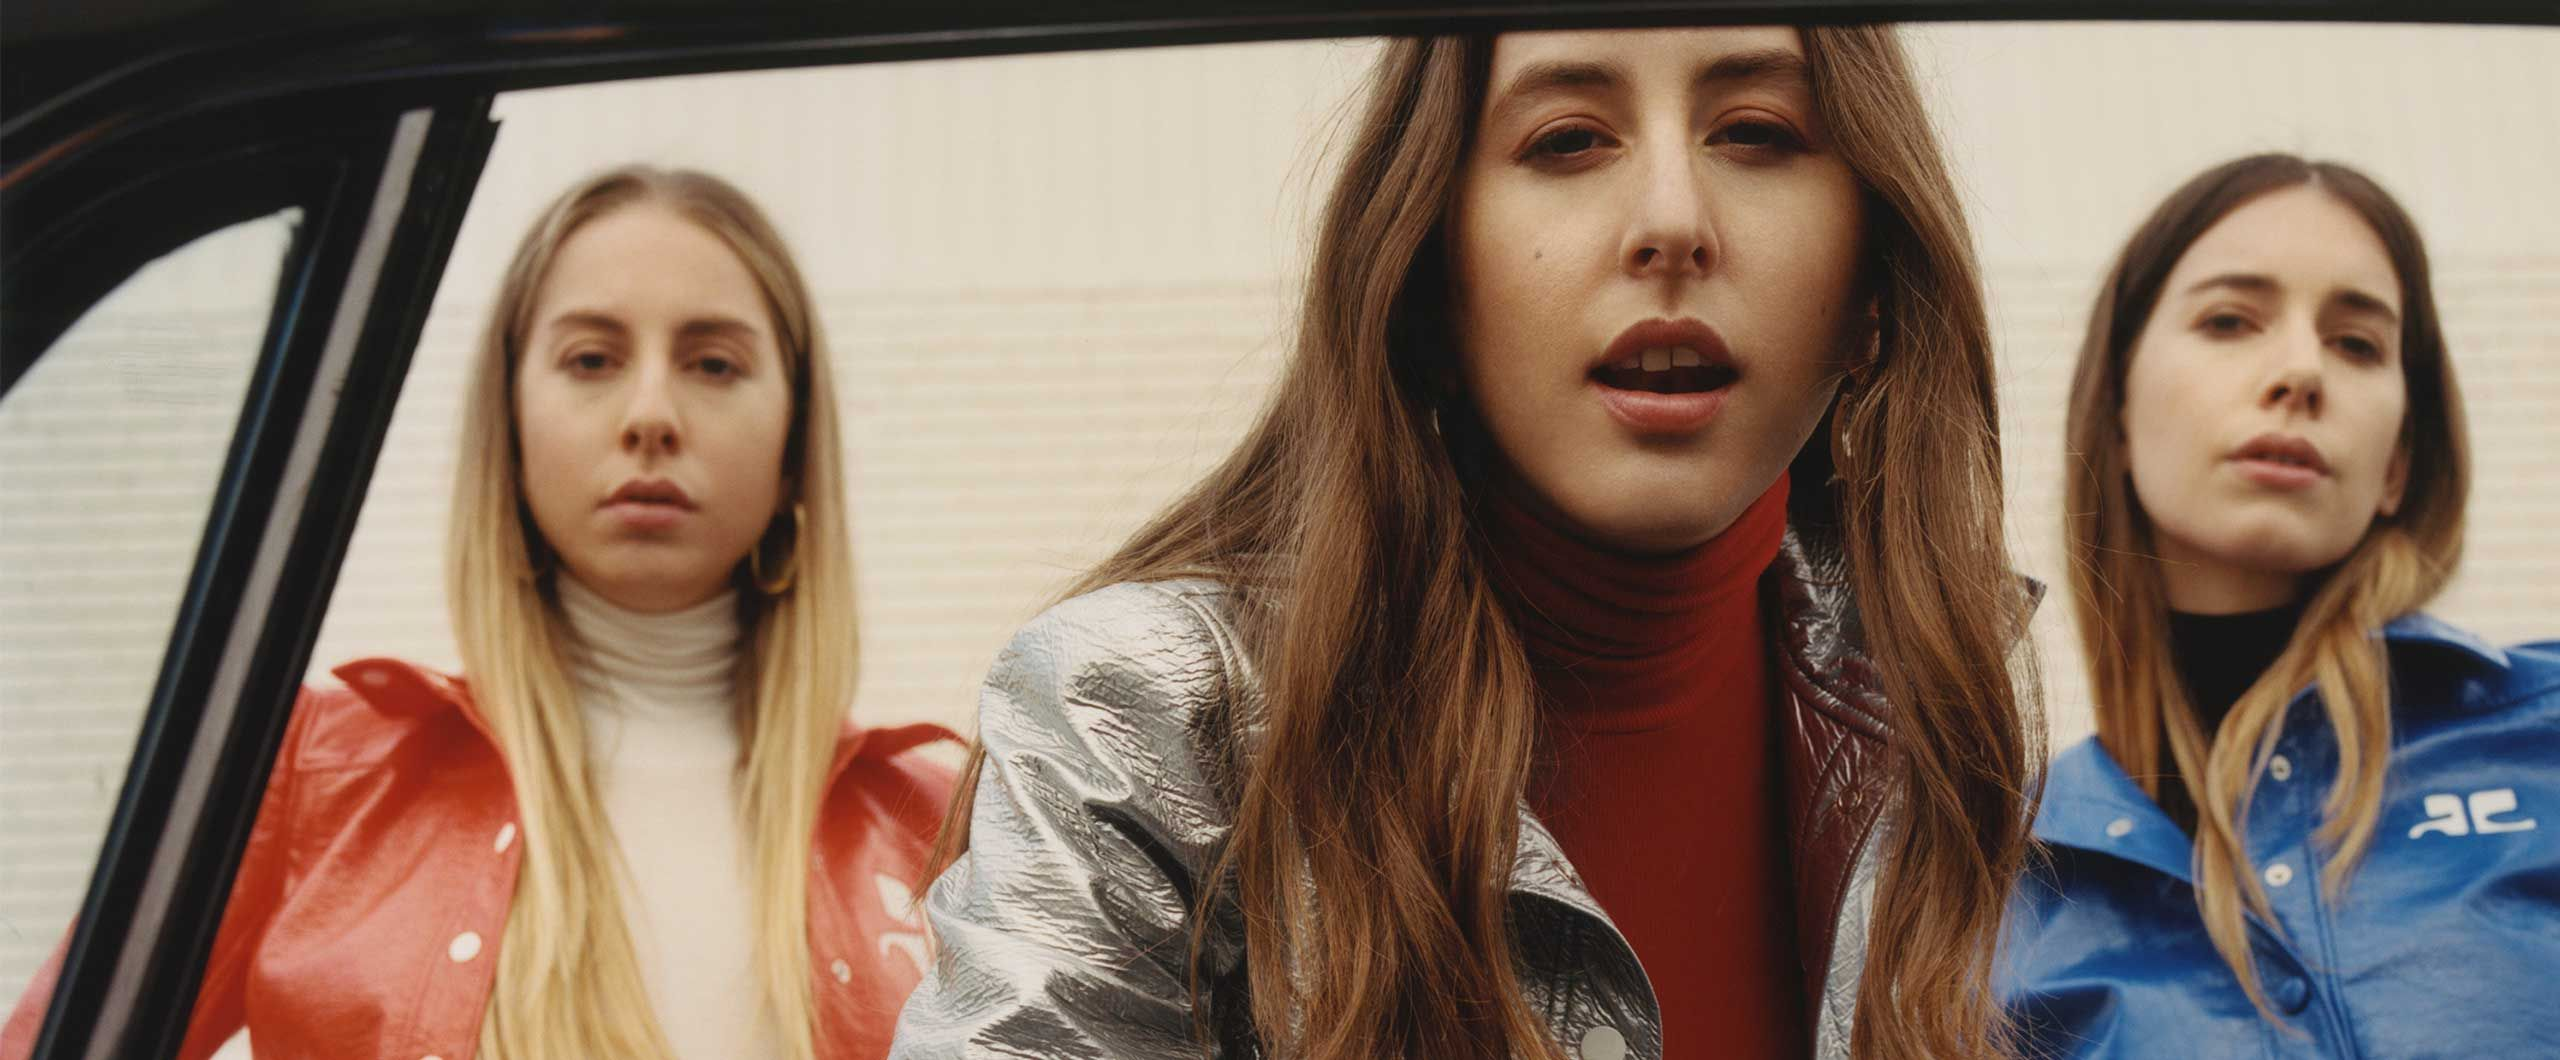 Nina Collins Twitter Porno haim: on the road with three jewish sisters who rock